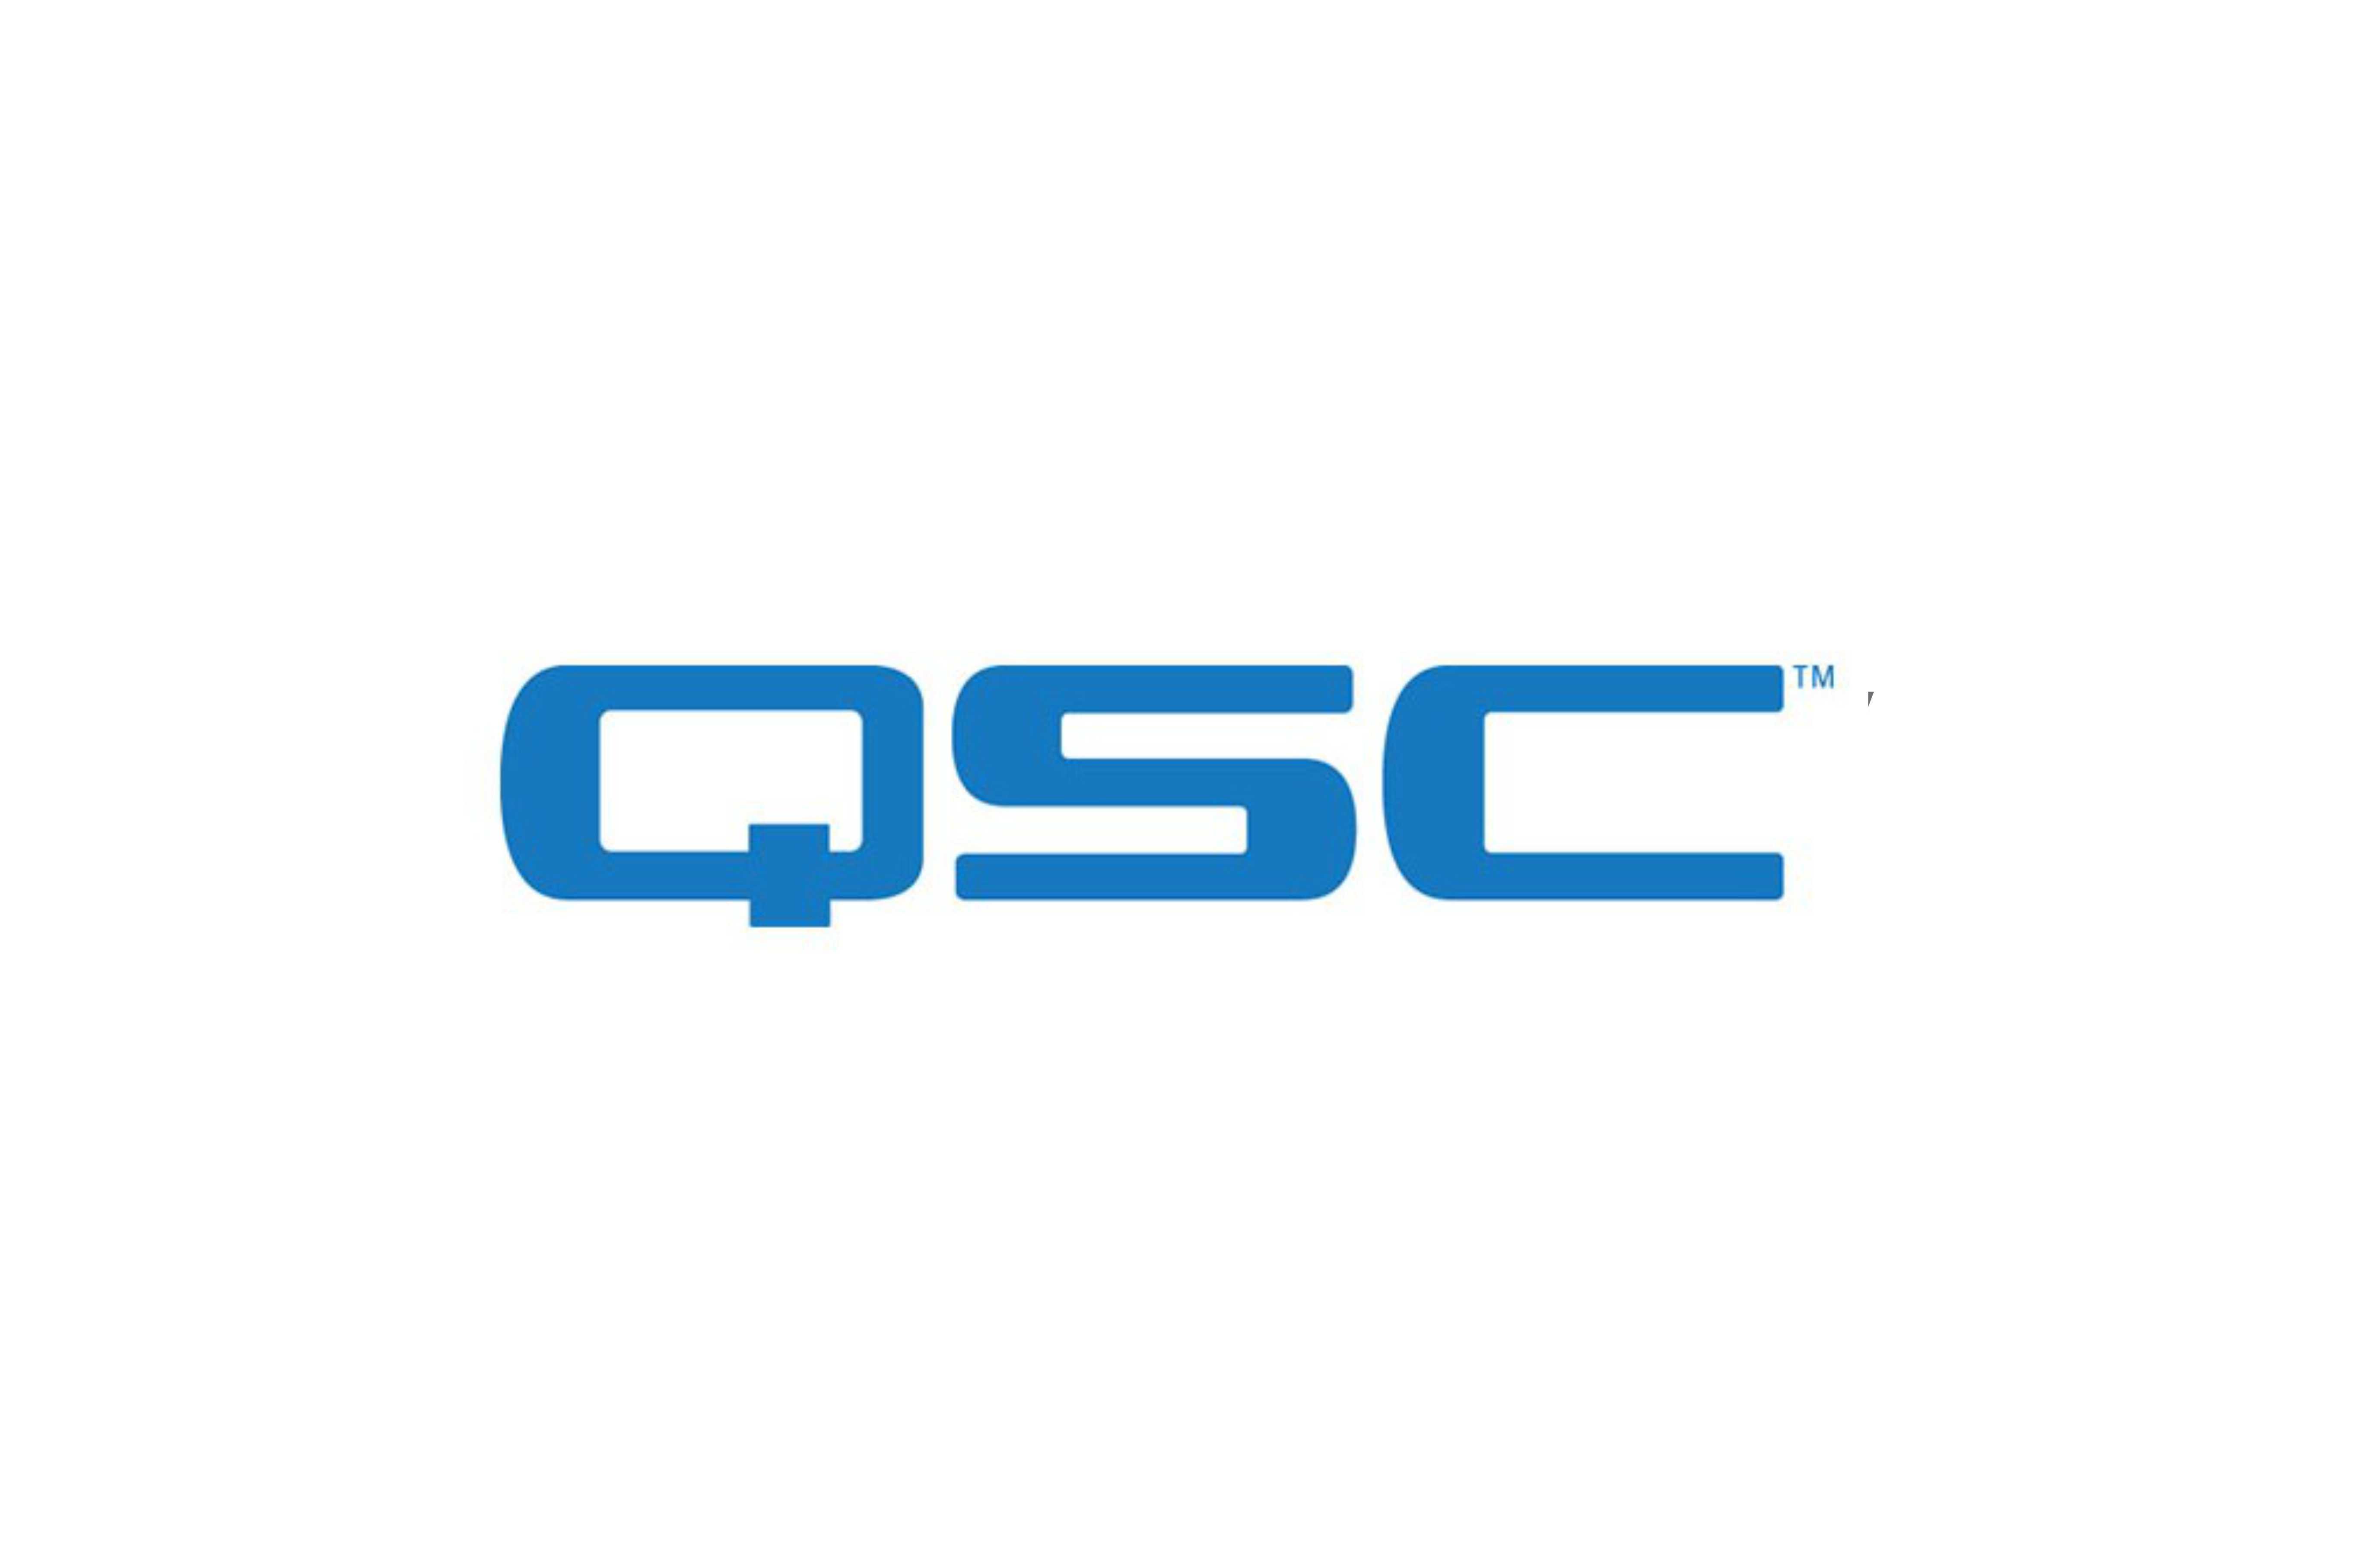 qsc_test_1